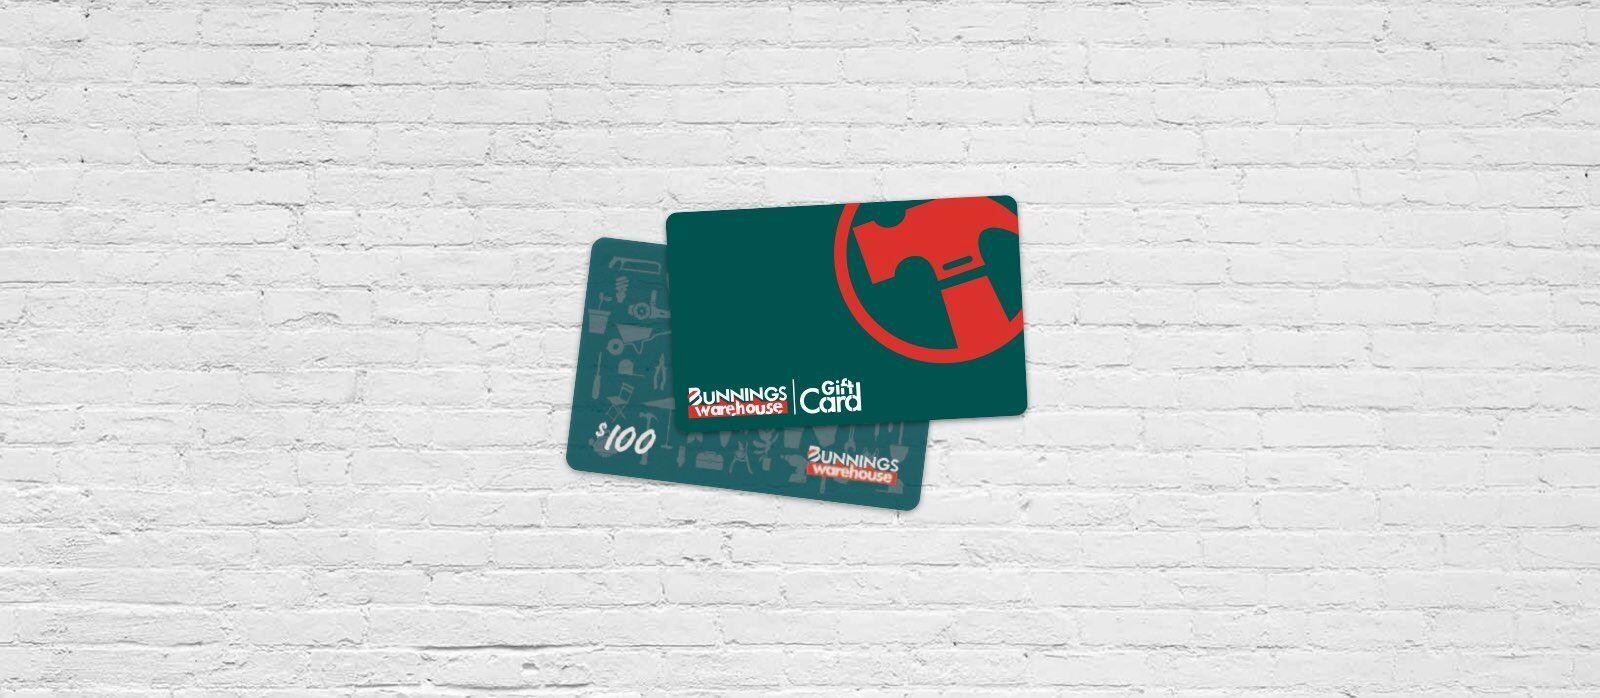 bunnings-gift-card